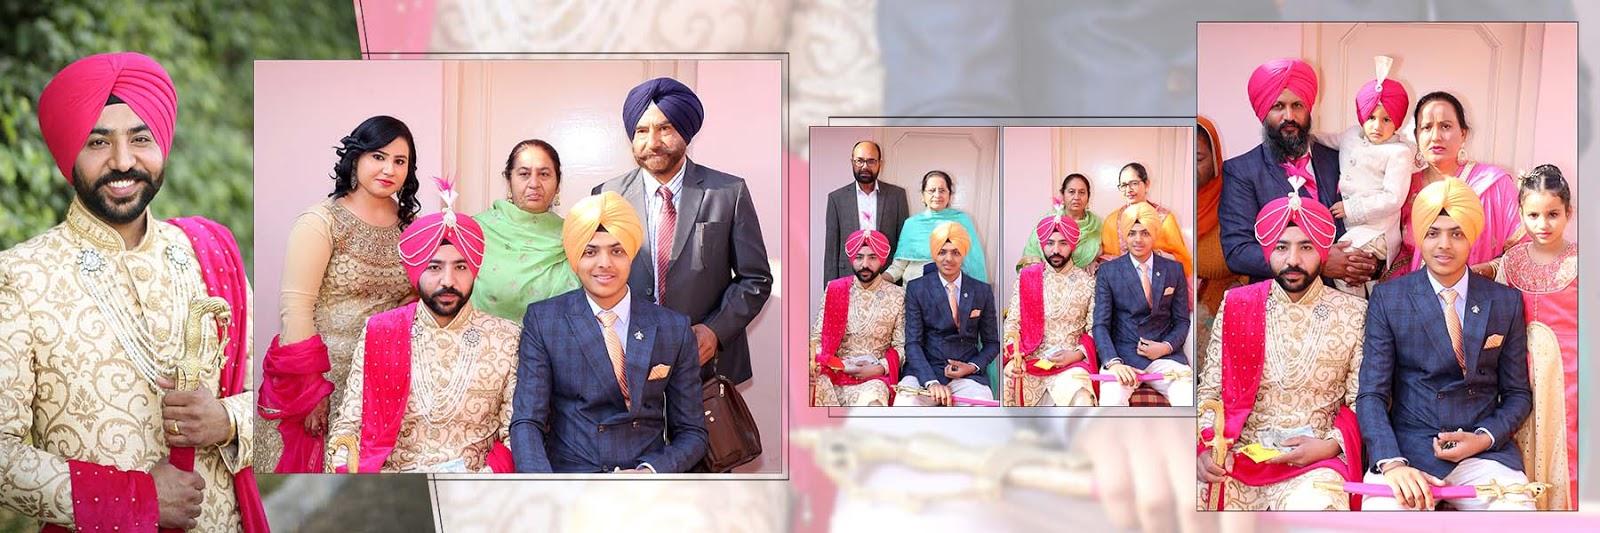 Hardev Arts Indian Album Psd Free Download 12x36